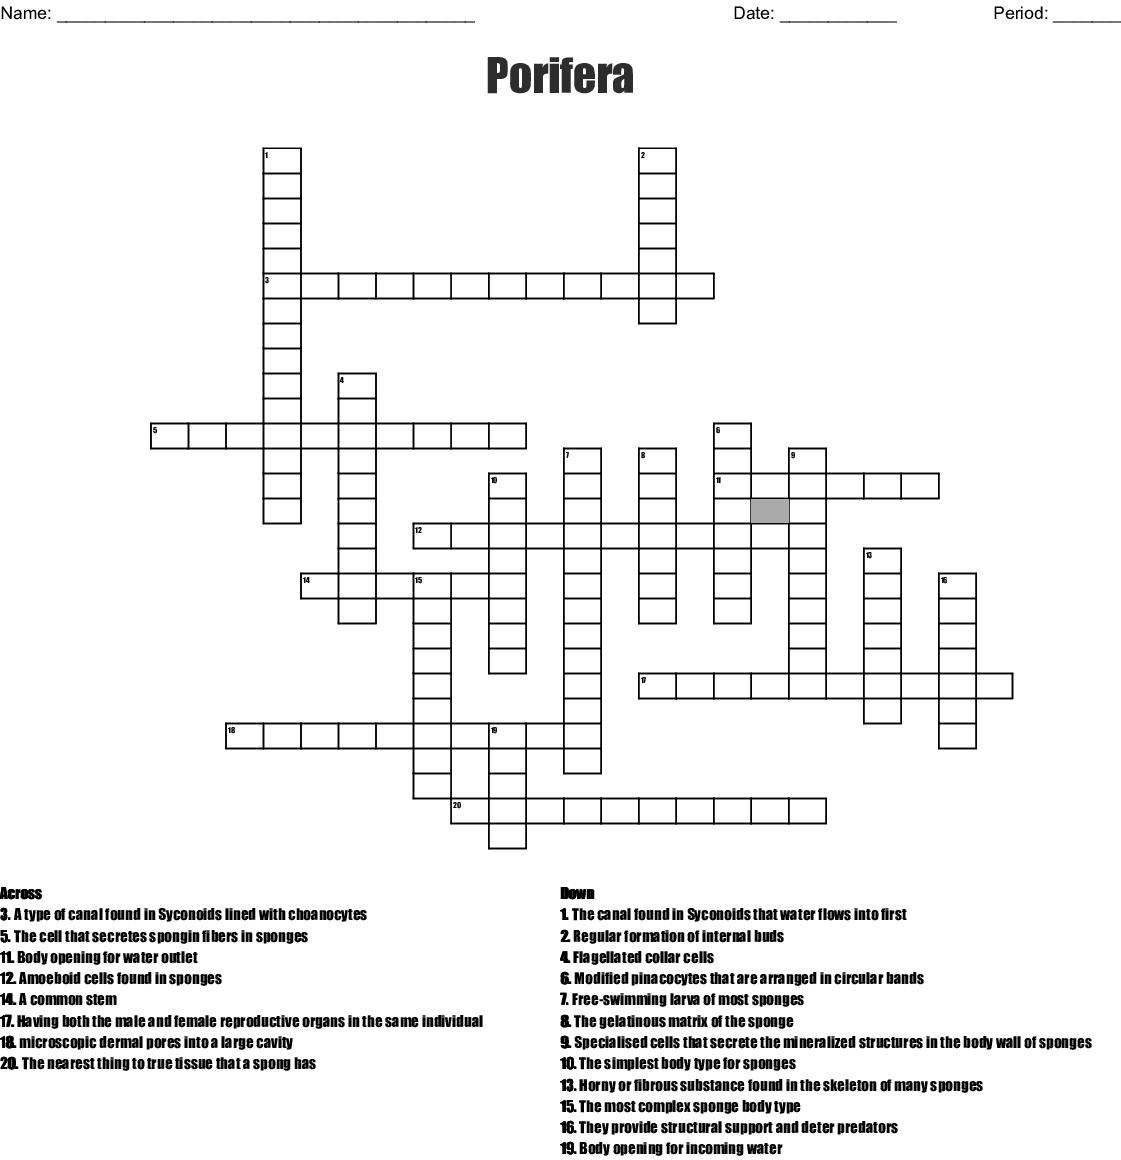 Porifera Crossword